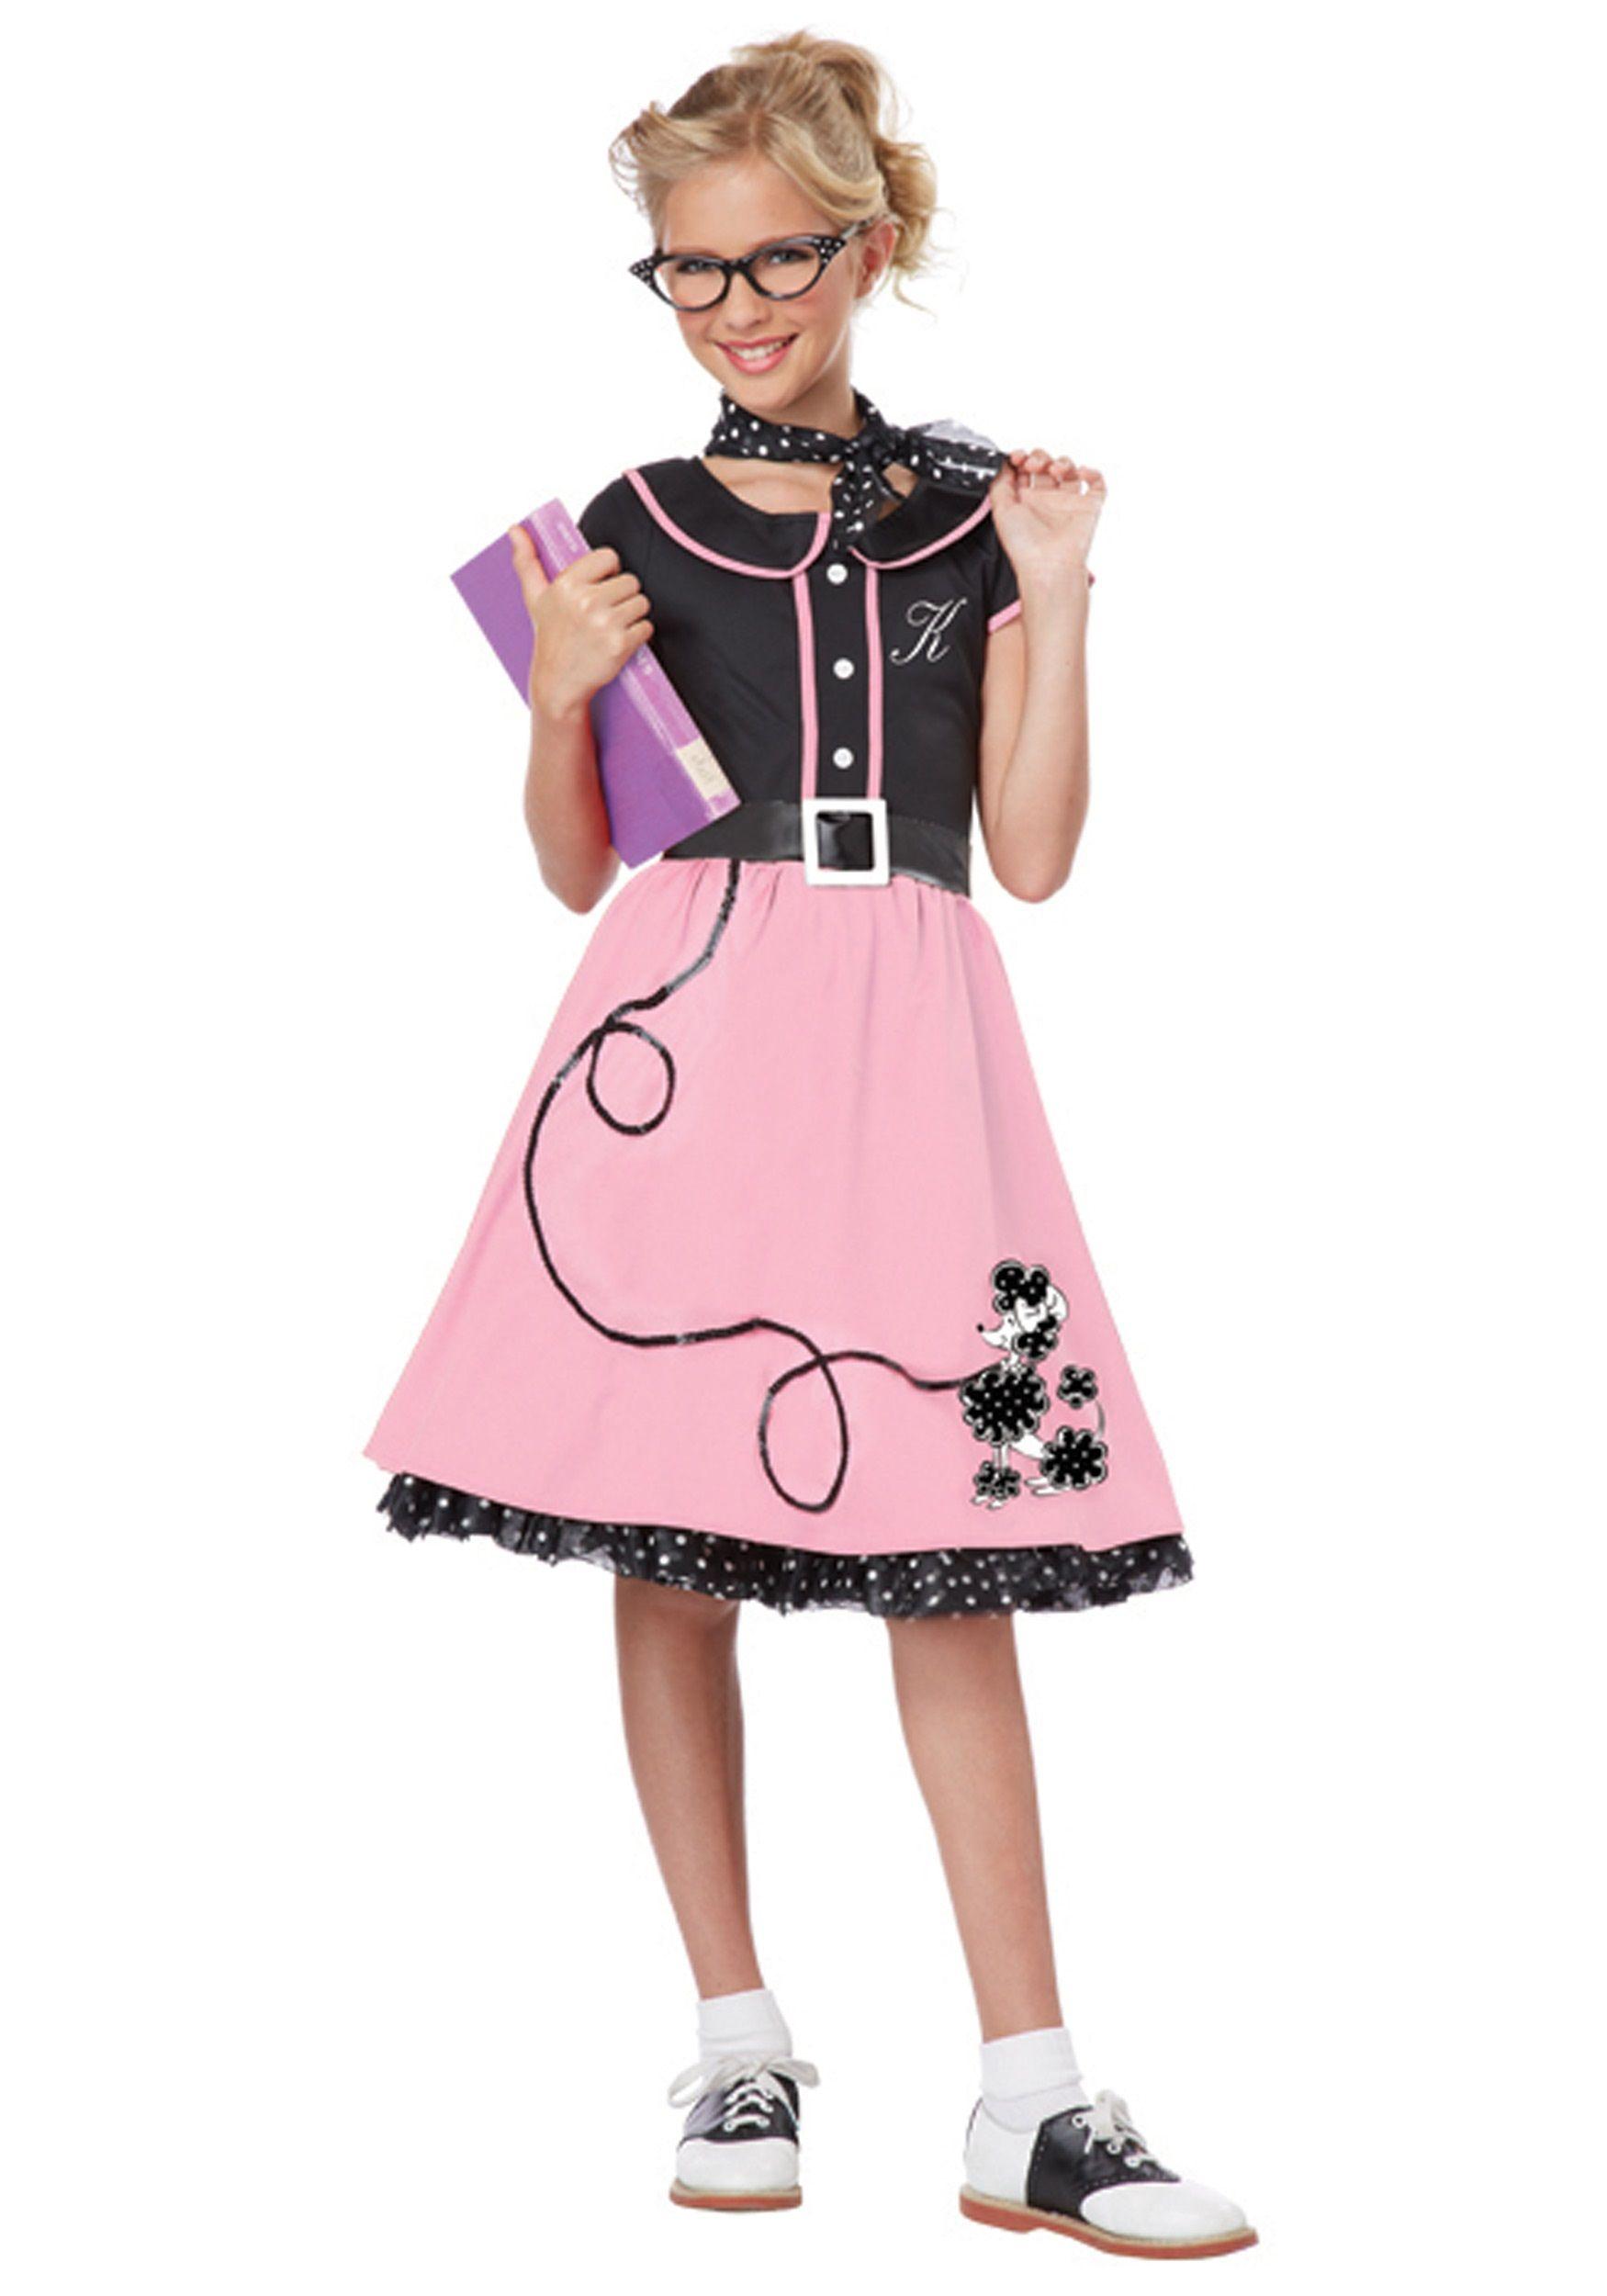 Home ladies costumes rodeo gal costume - Girls Pink 50 S Sweetheart Costume Kids Costumes Girlsgirl